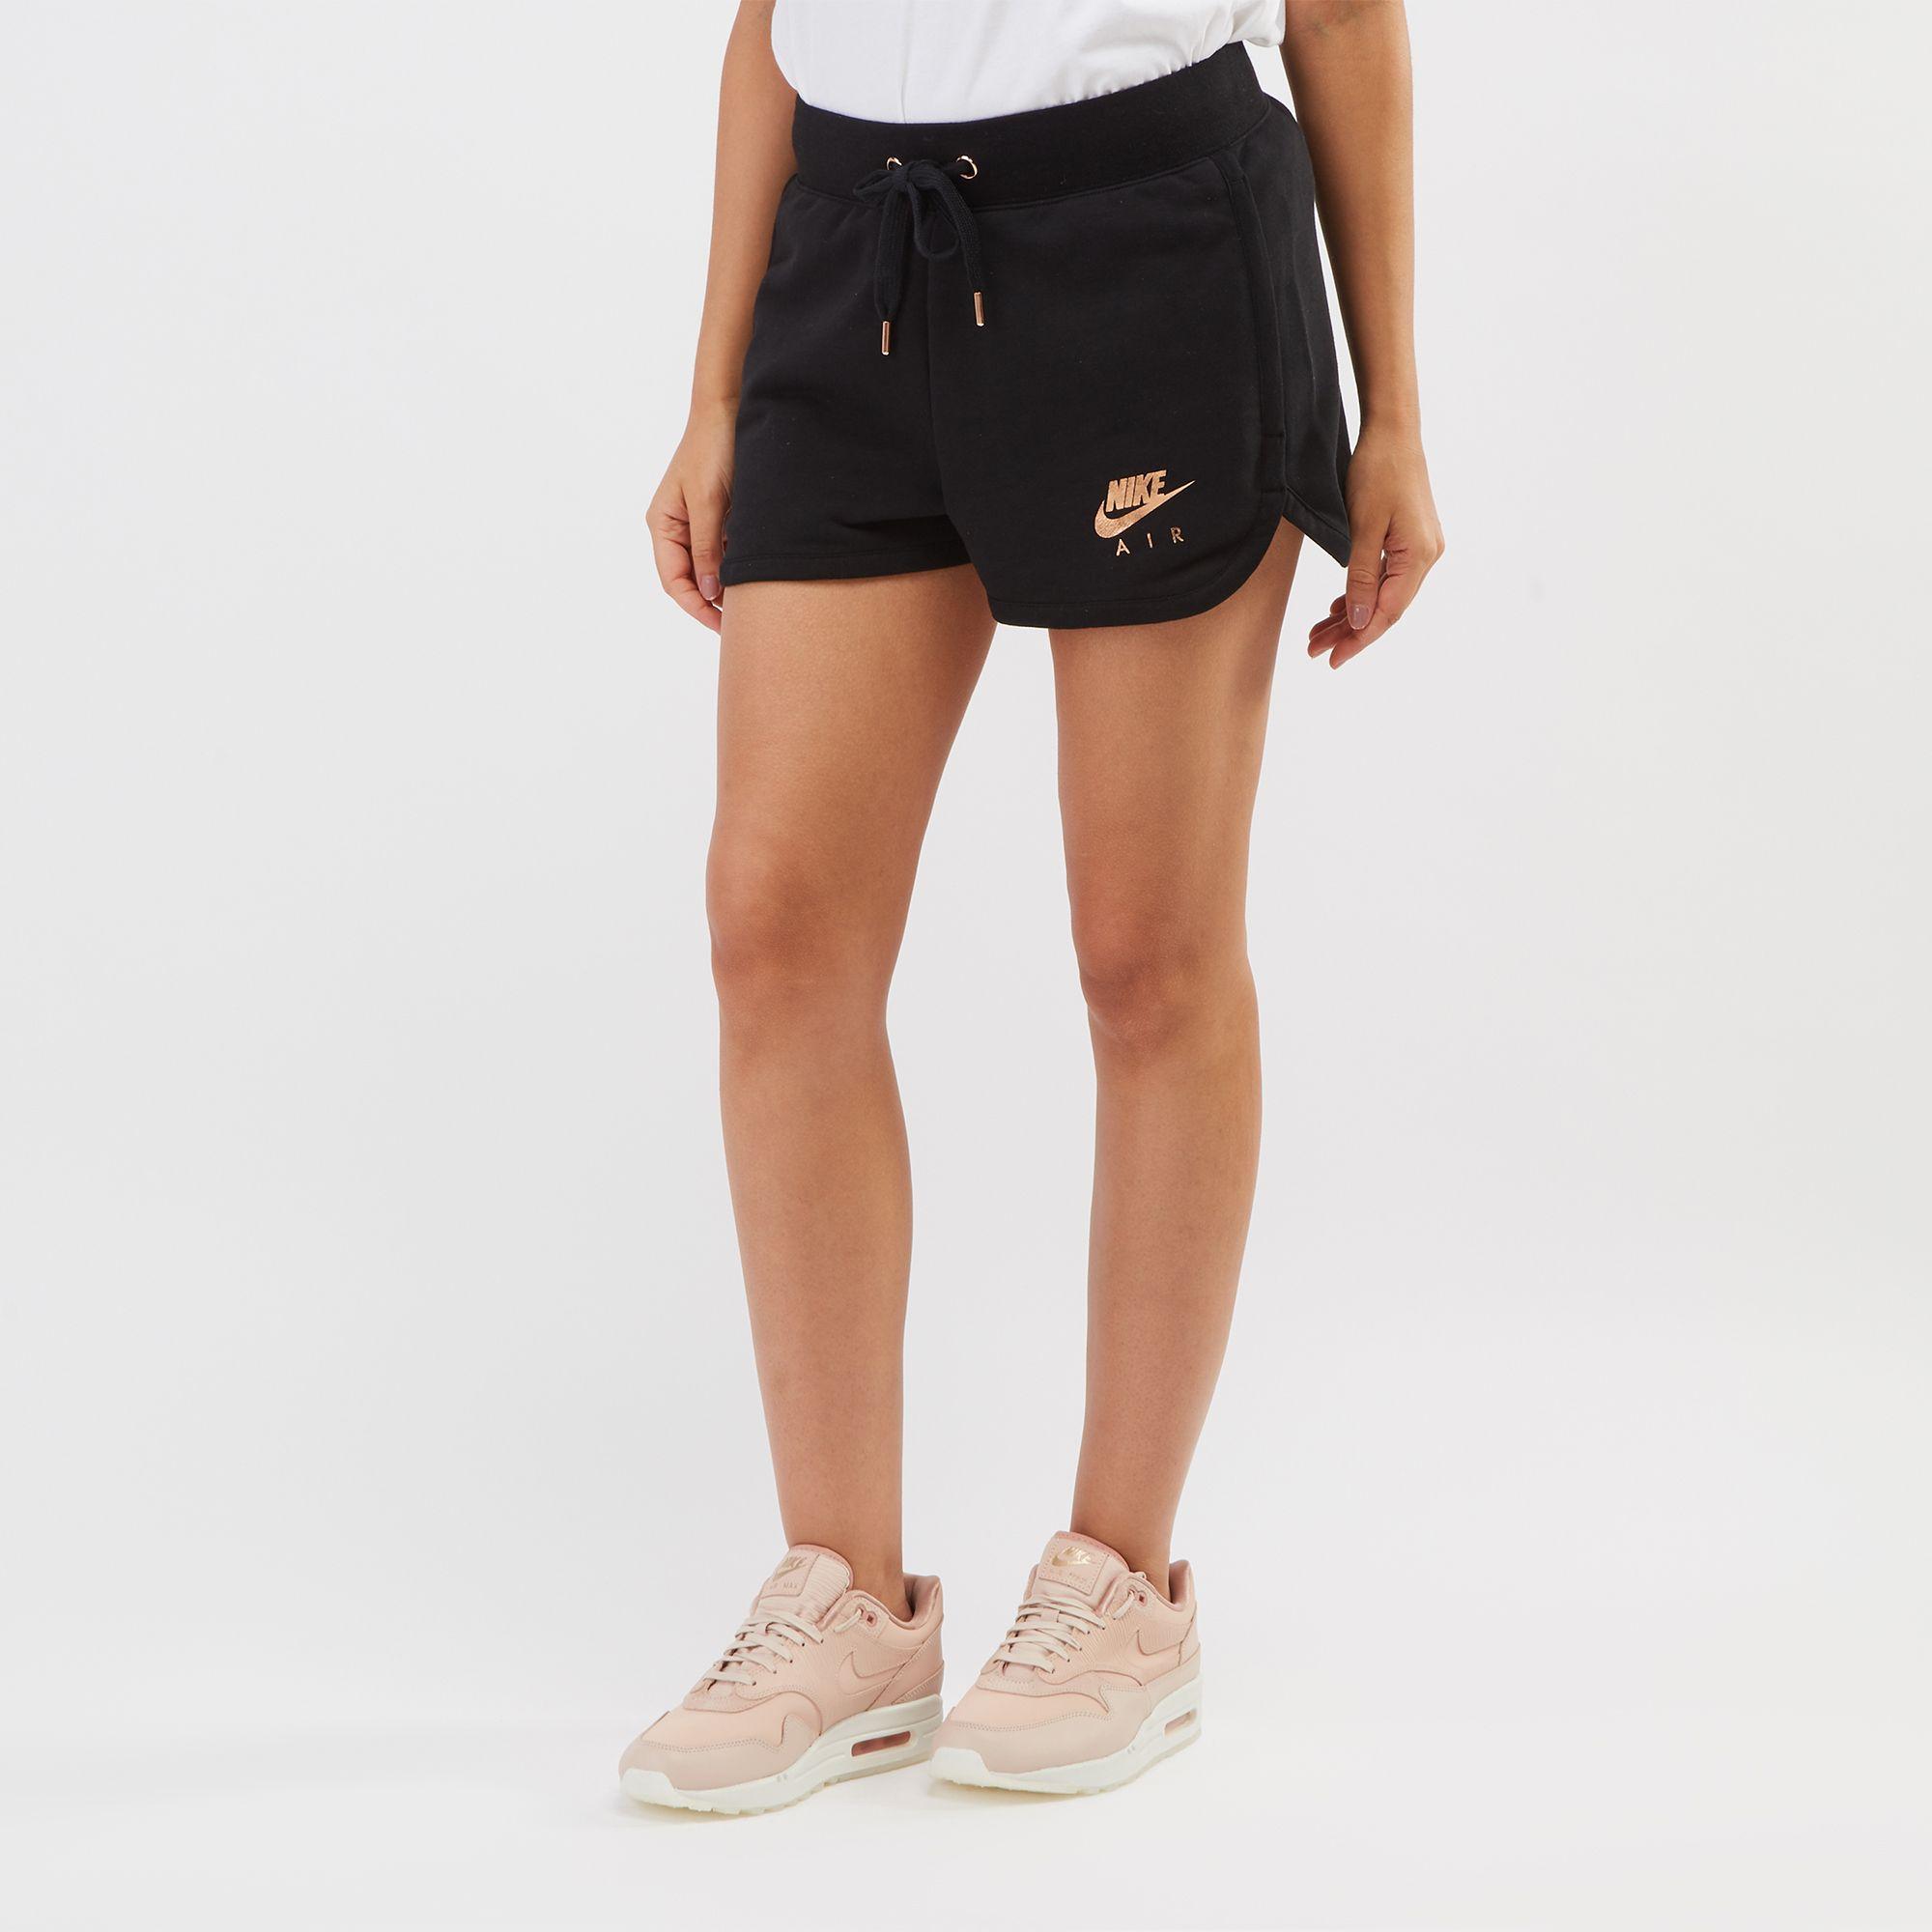 2f634aff24b4 Shop Black Nike Air Fleece Shorts